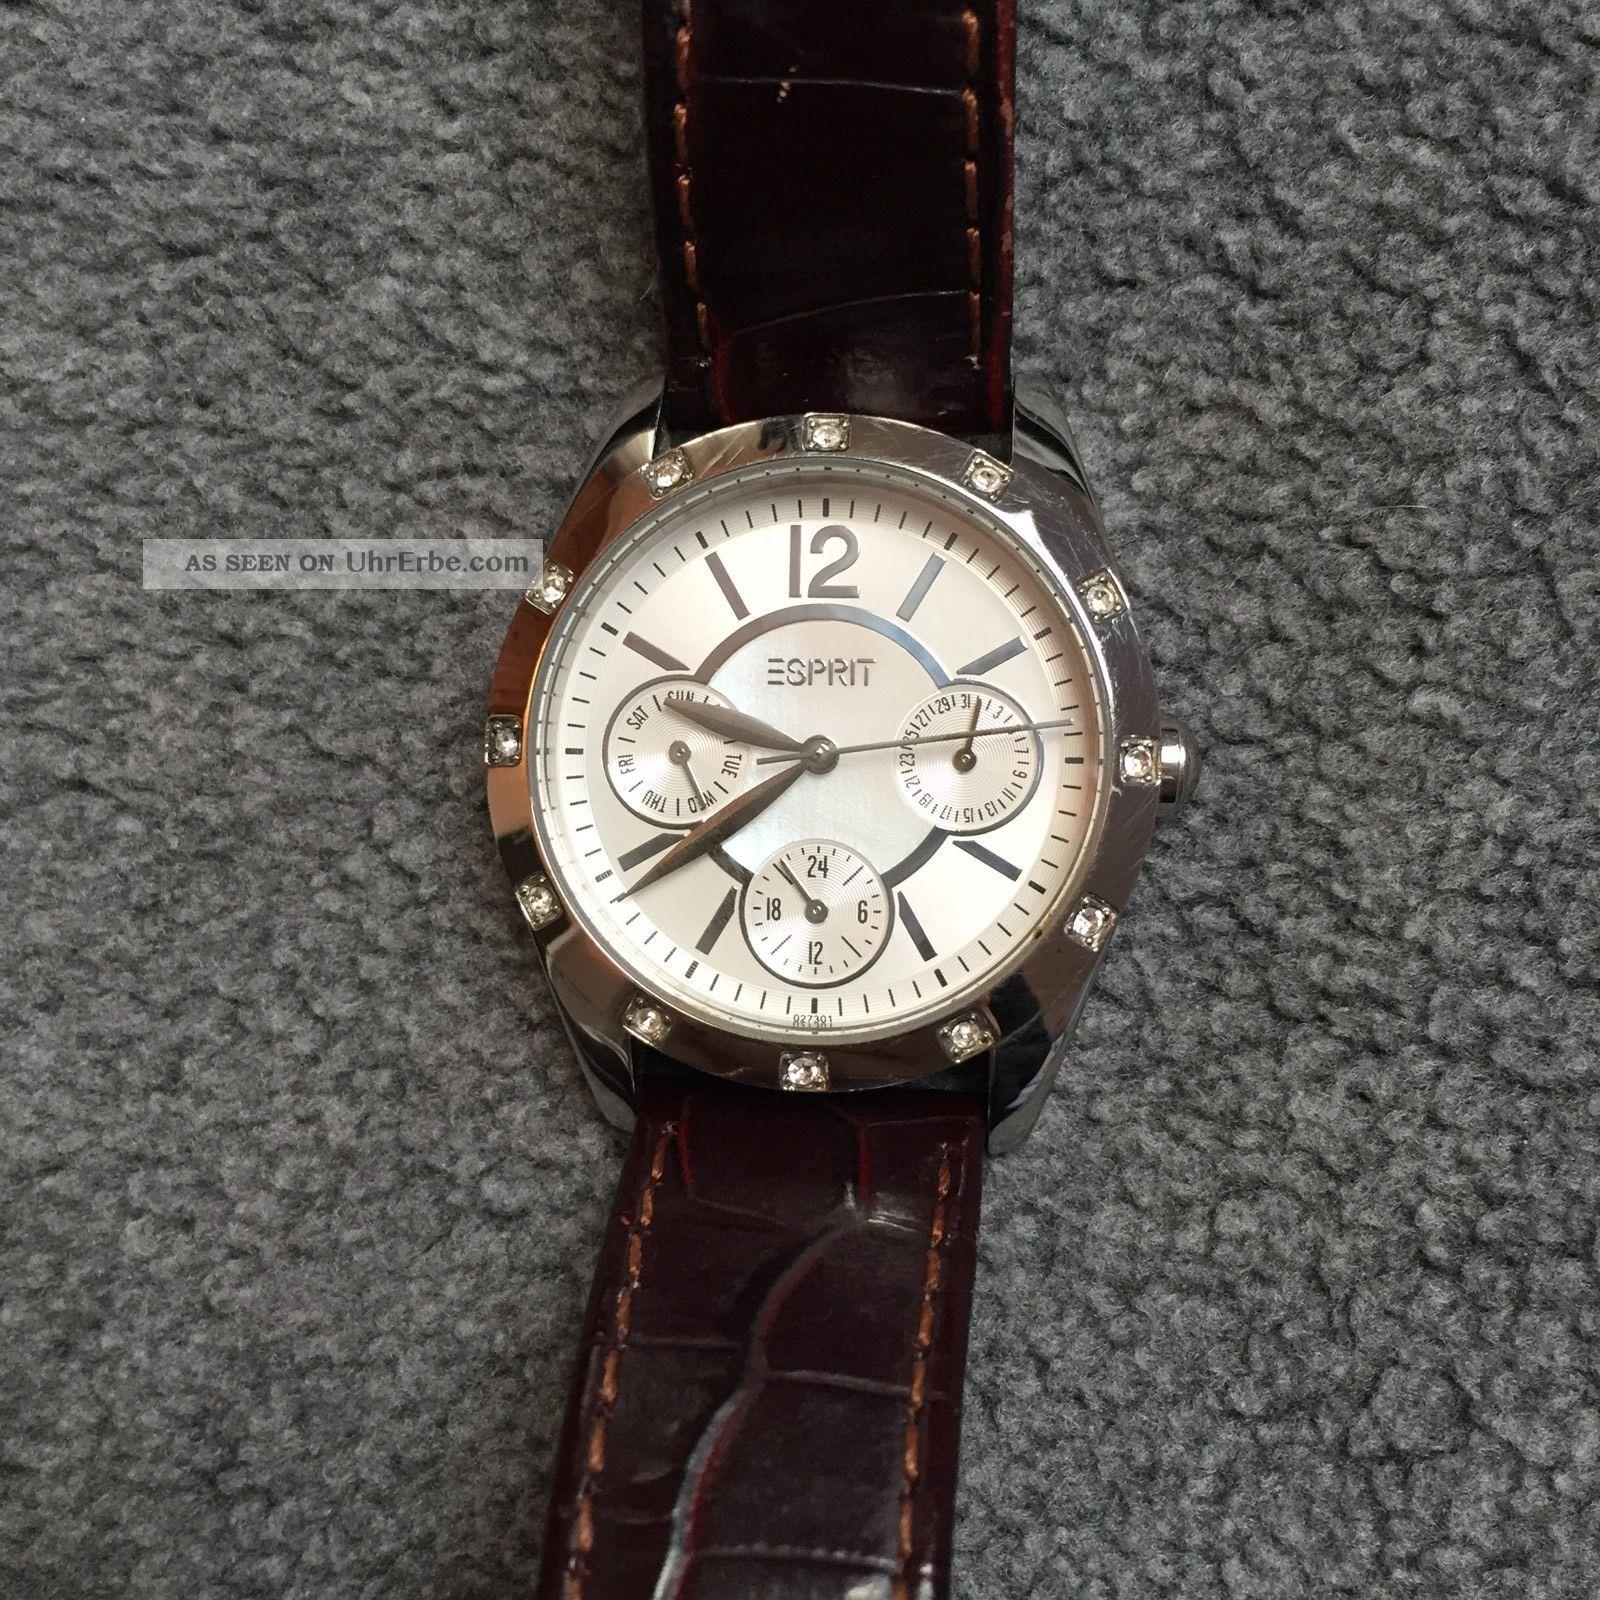 Esprit Damenuhr Uhr Braun Silber Armbanduhren Bild